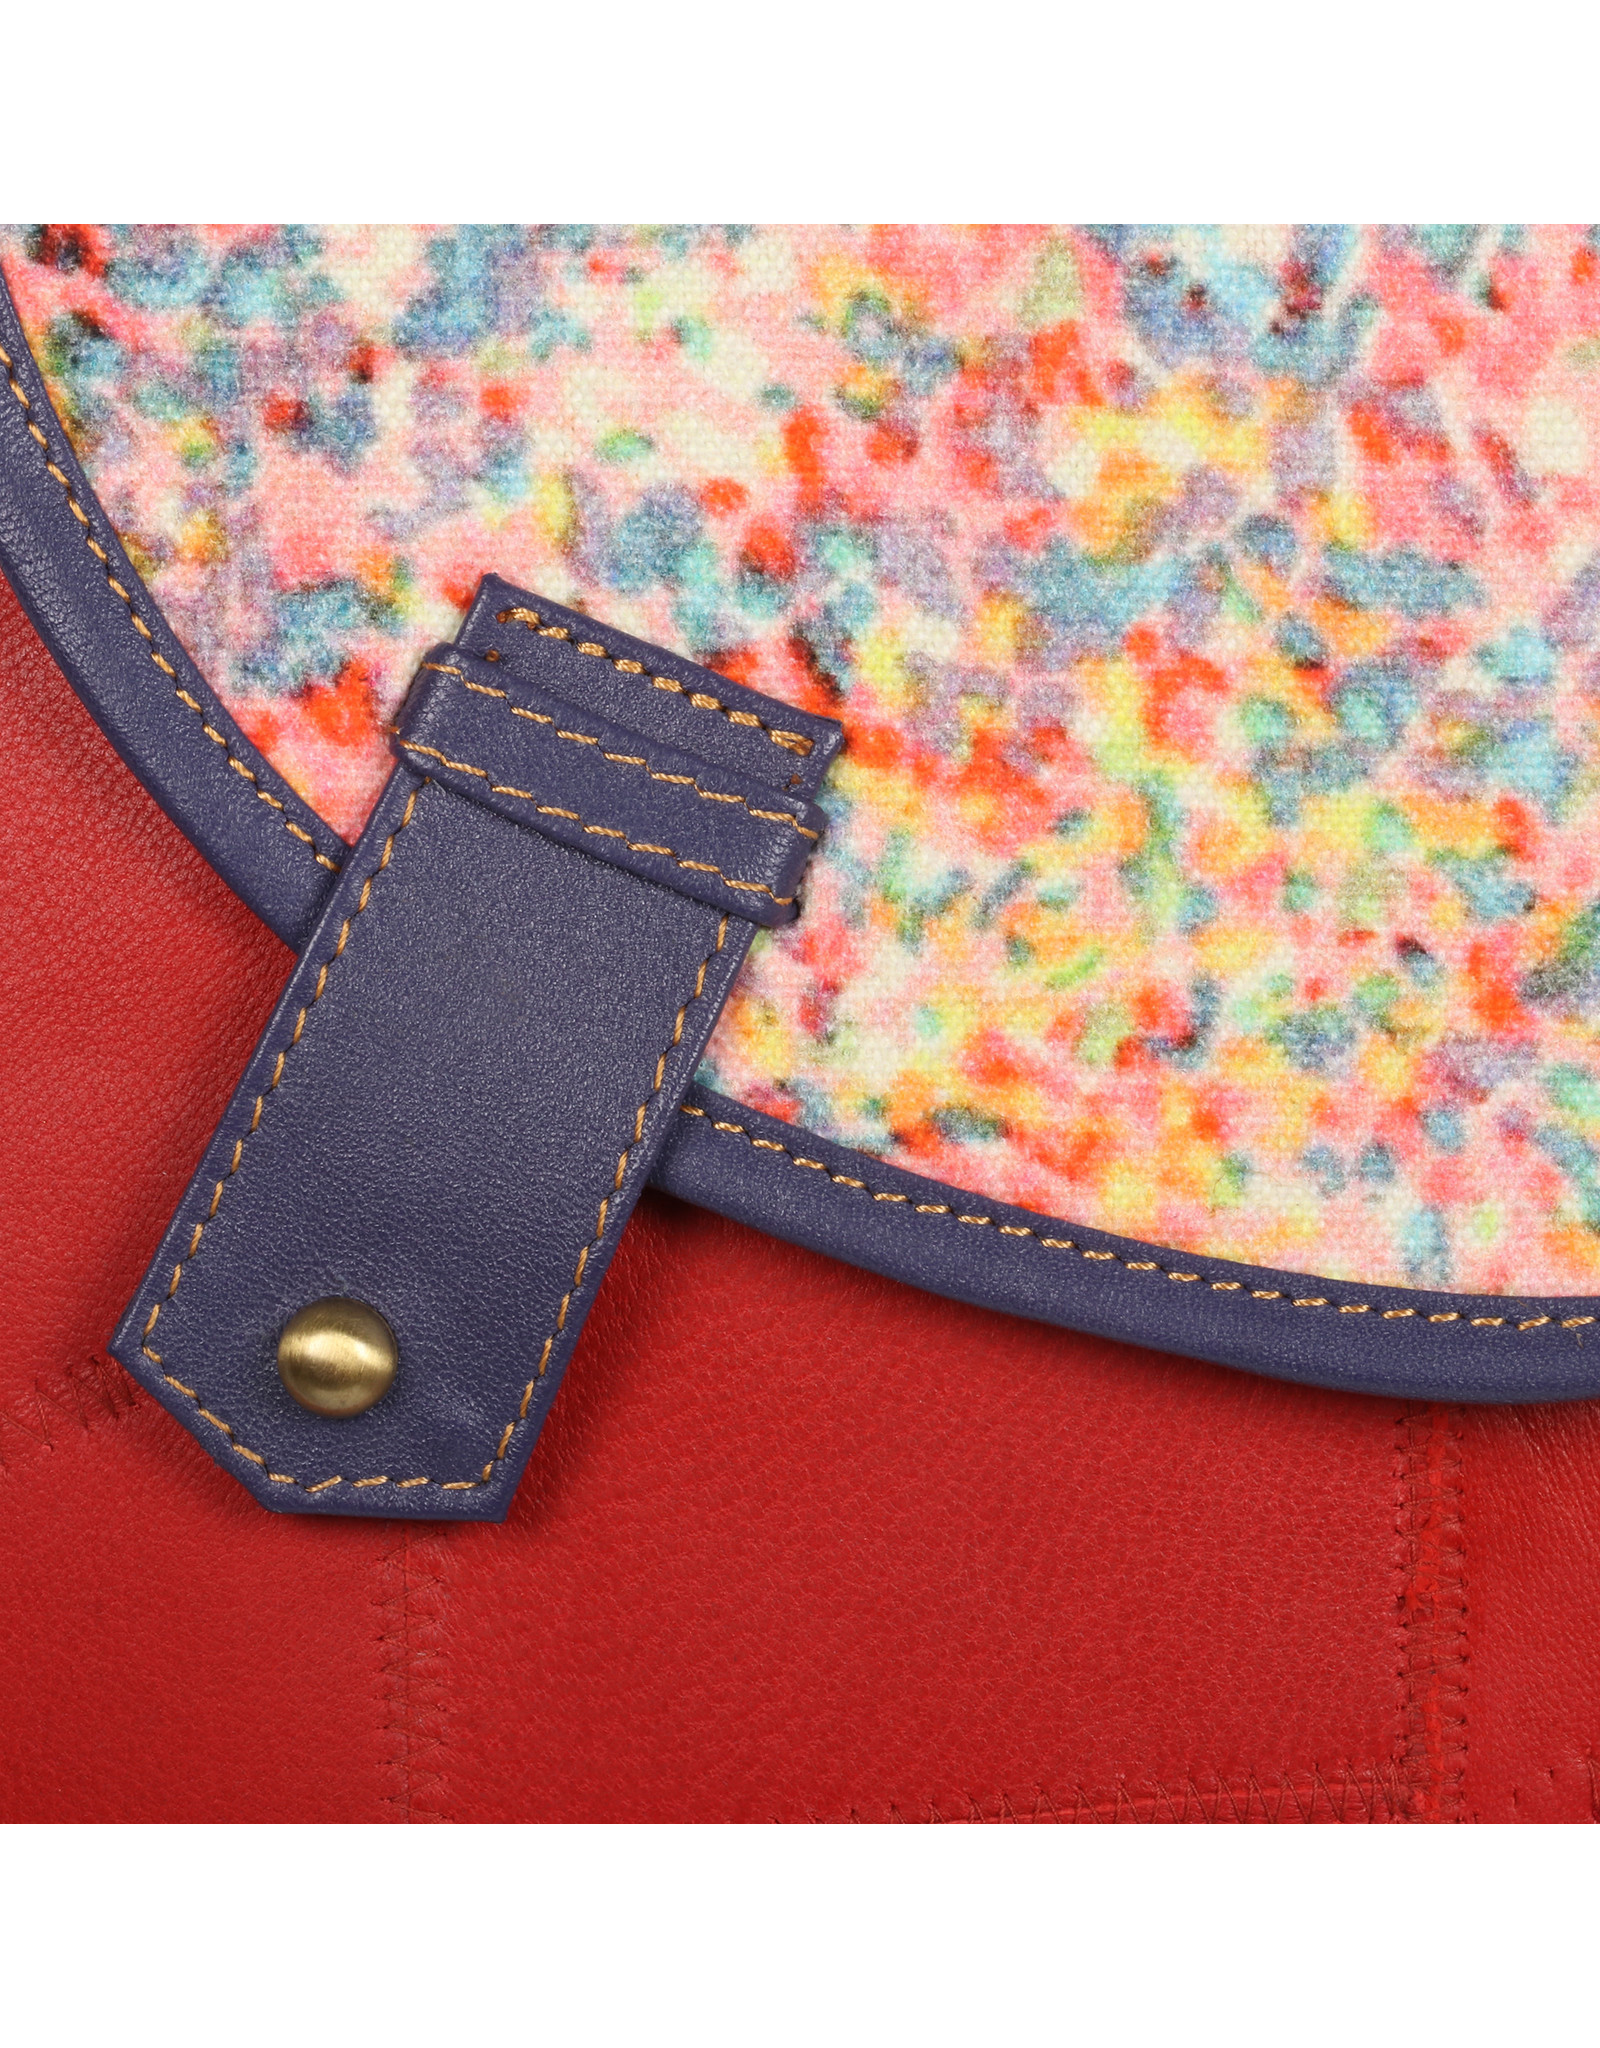 Vann & Co S2V-213 RFID Small Crossbody Bag with Flap